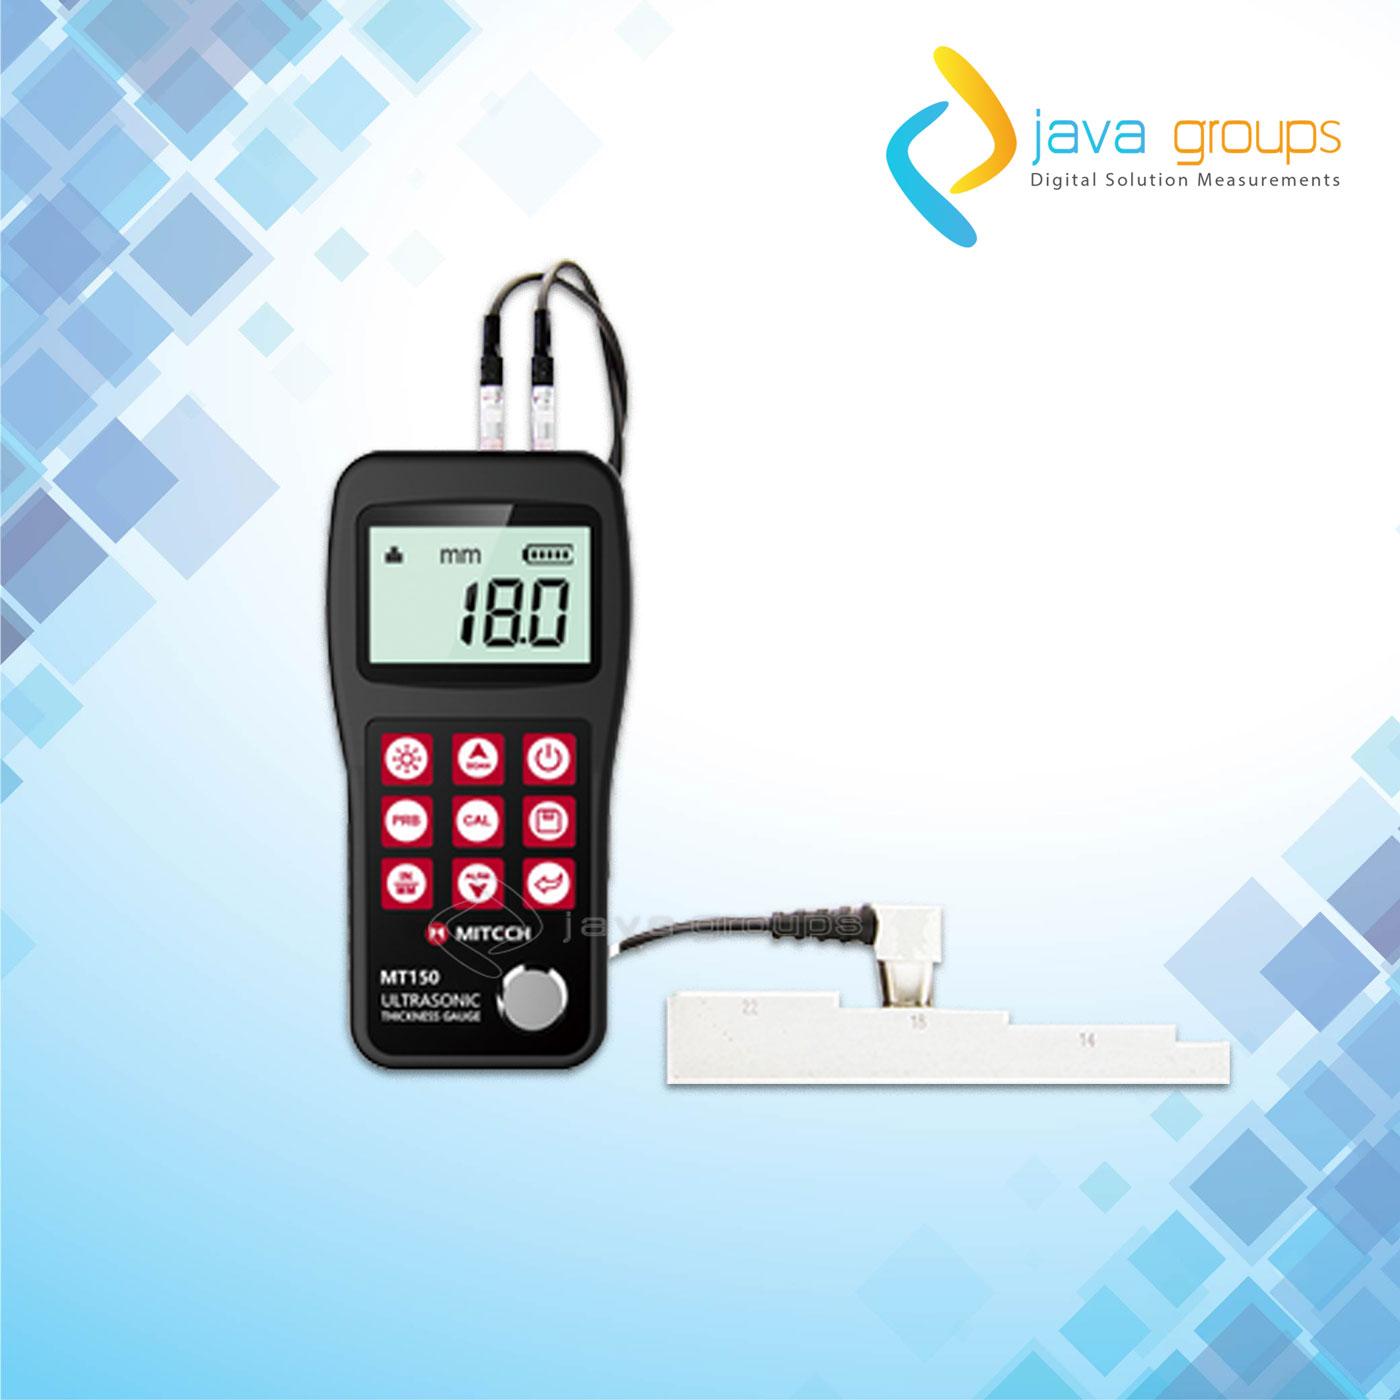 Alat Pengukur Digital Ketebalan Ultrasonik Mitech MT150